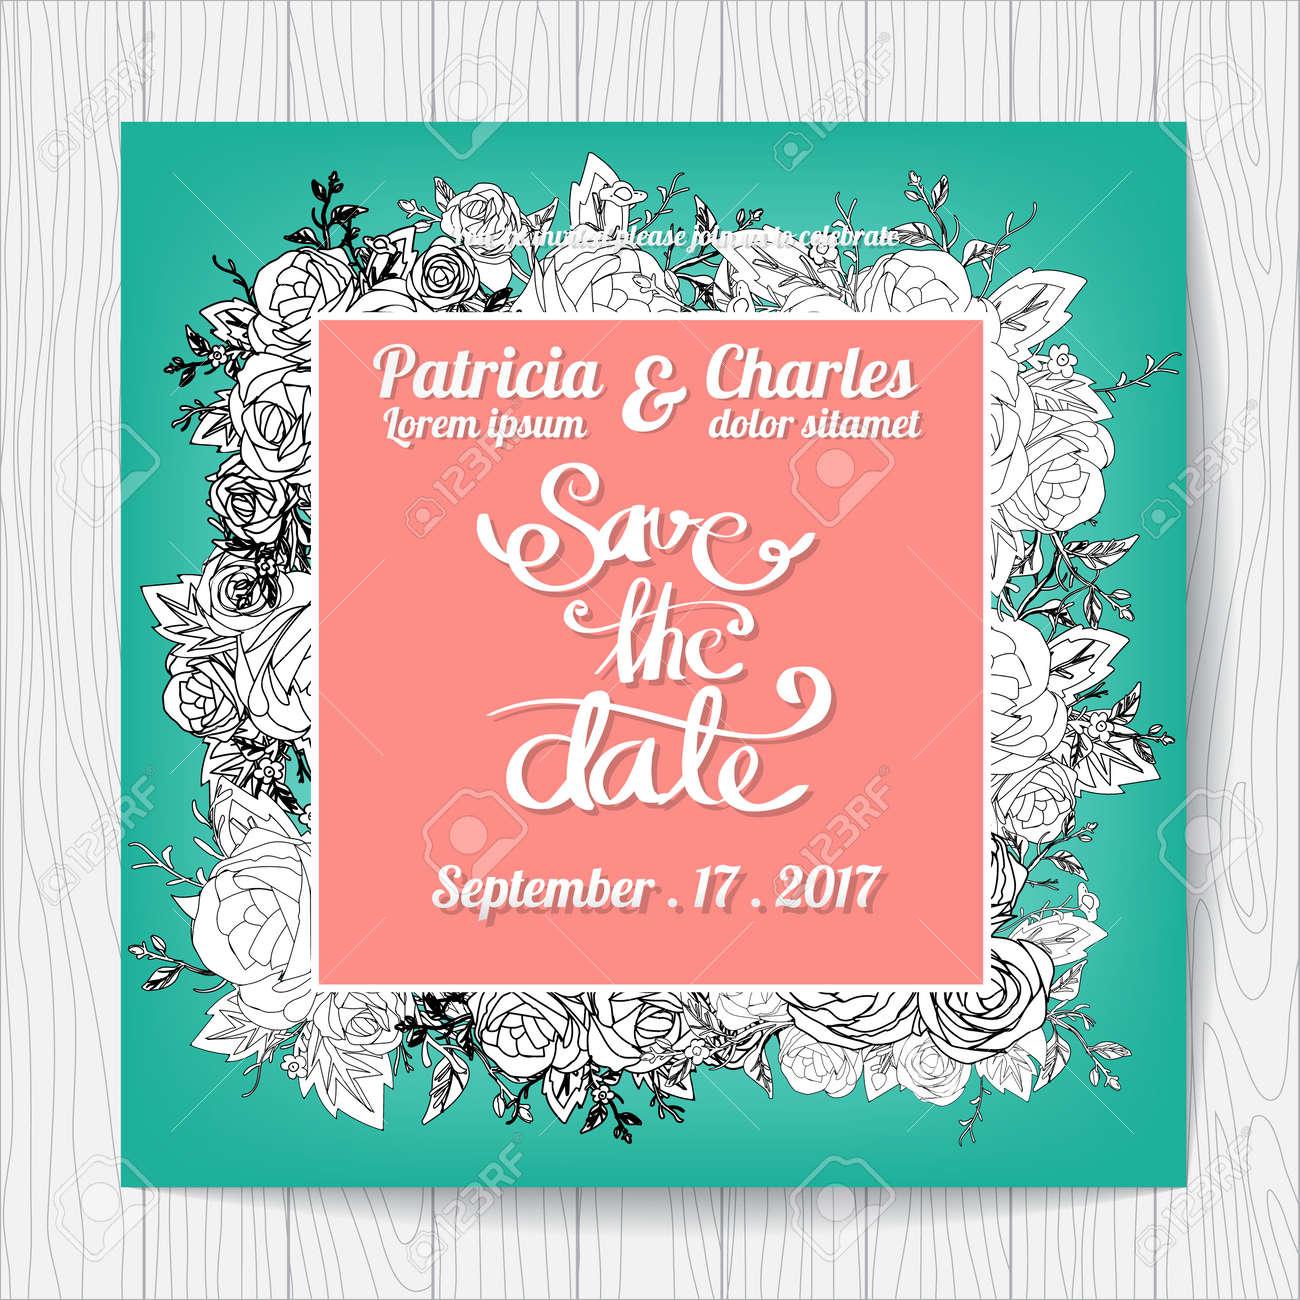 Wedding invitation card templates royalty free cliparts vetores e imagens wedding invitation card templates stopboris Gallery